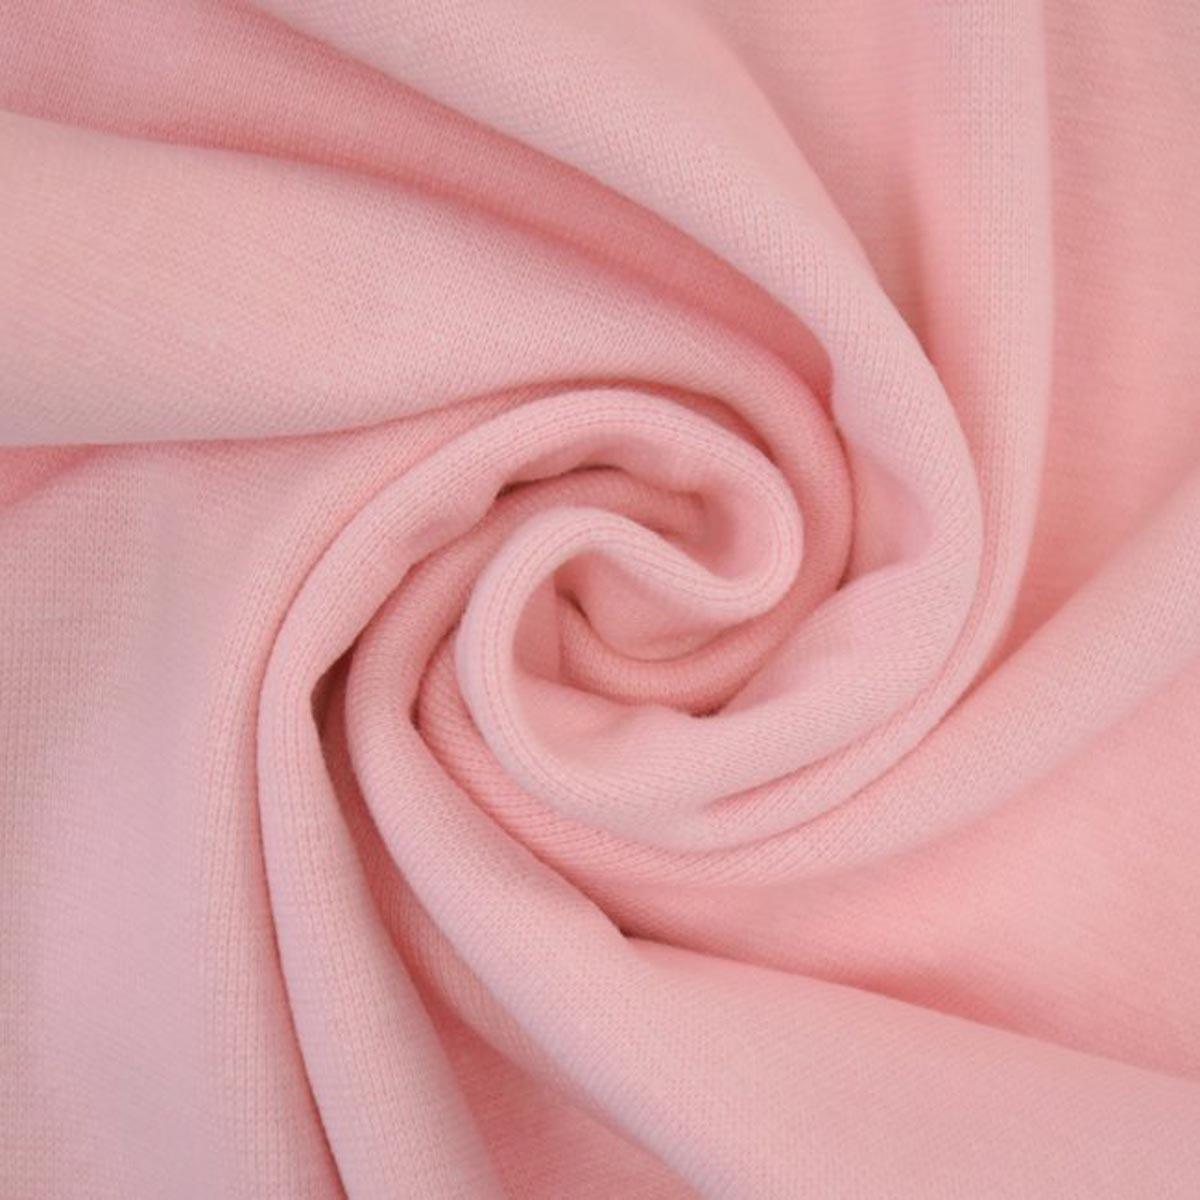 50cm Bündchen / Schlauchware glatt hell rosa 3017